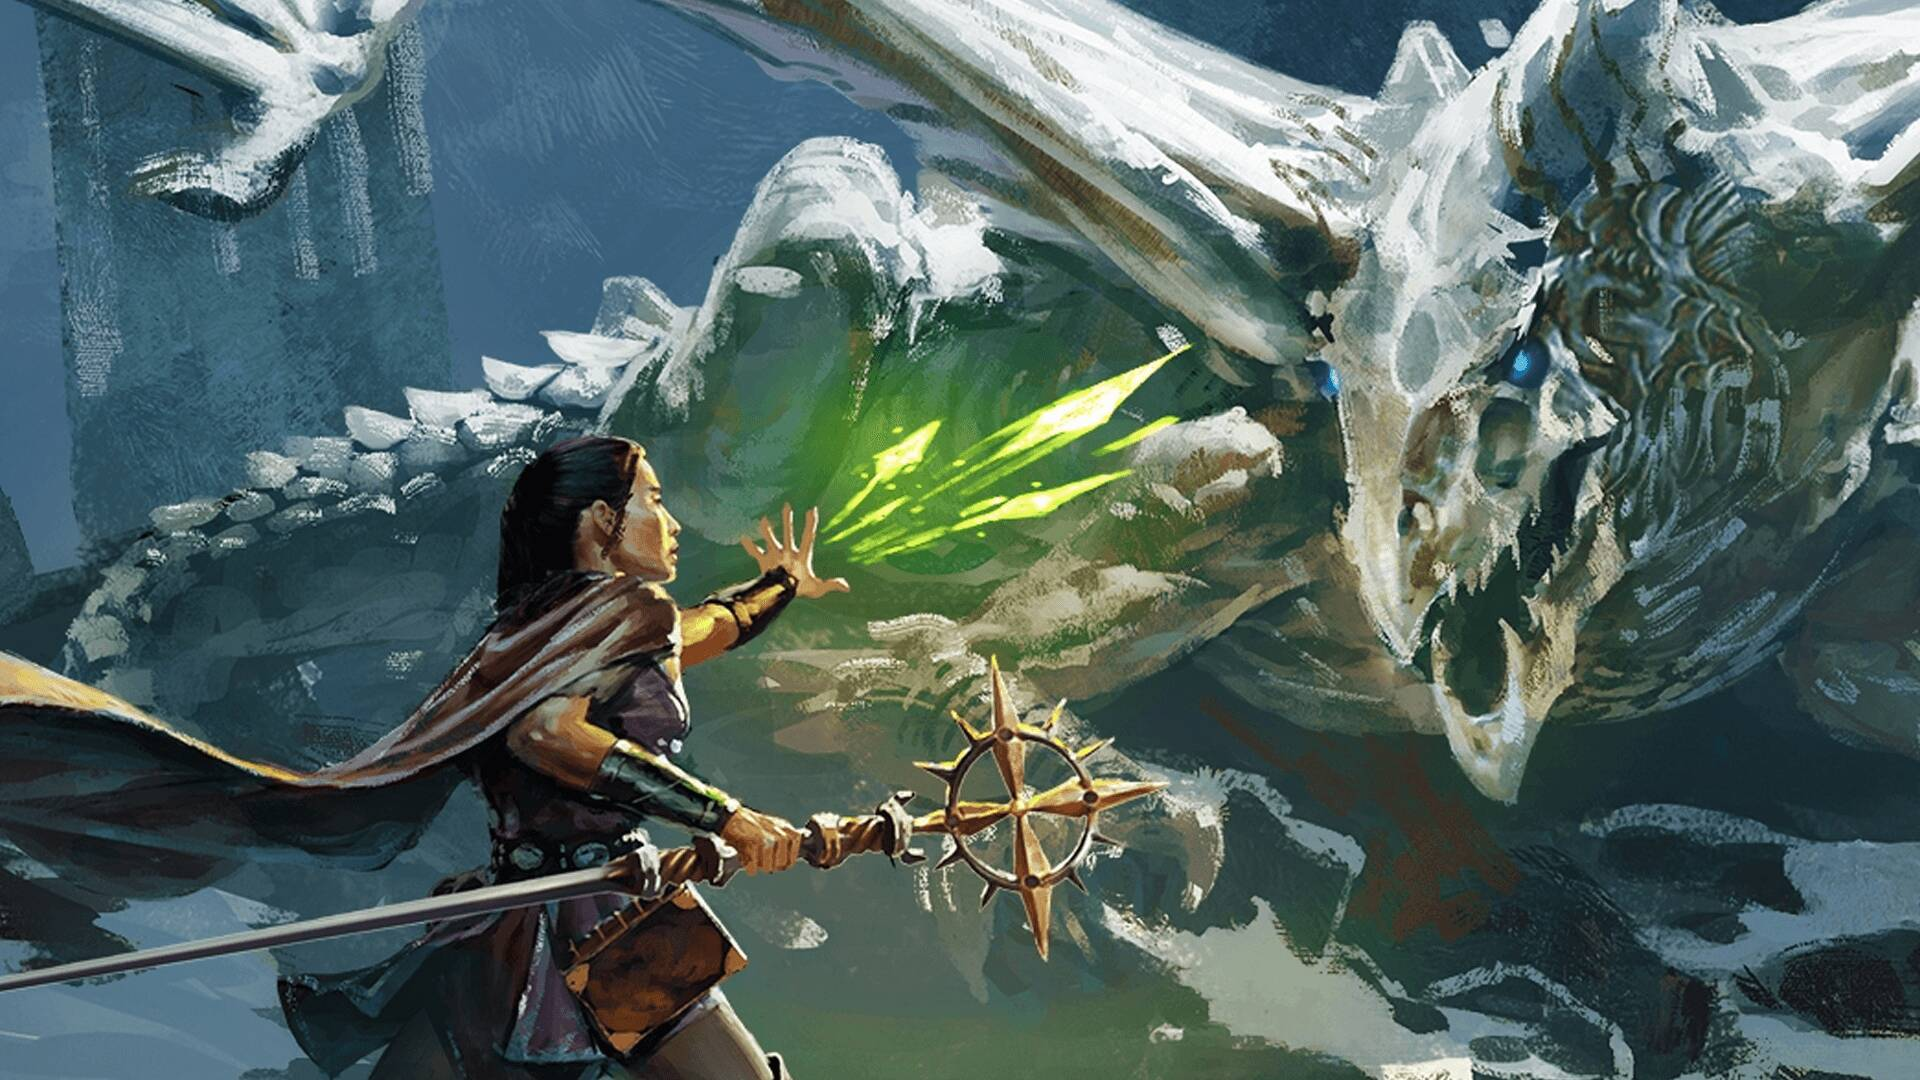 Dungeons & Dragons uscita manuali italiani